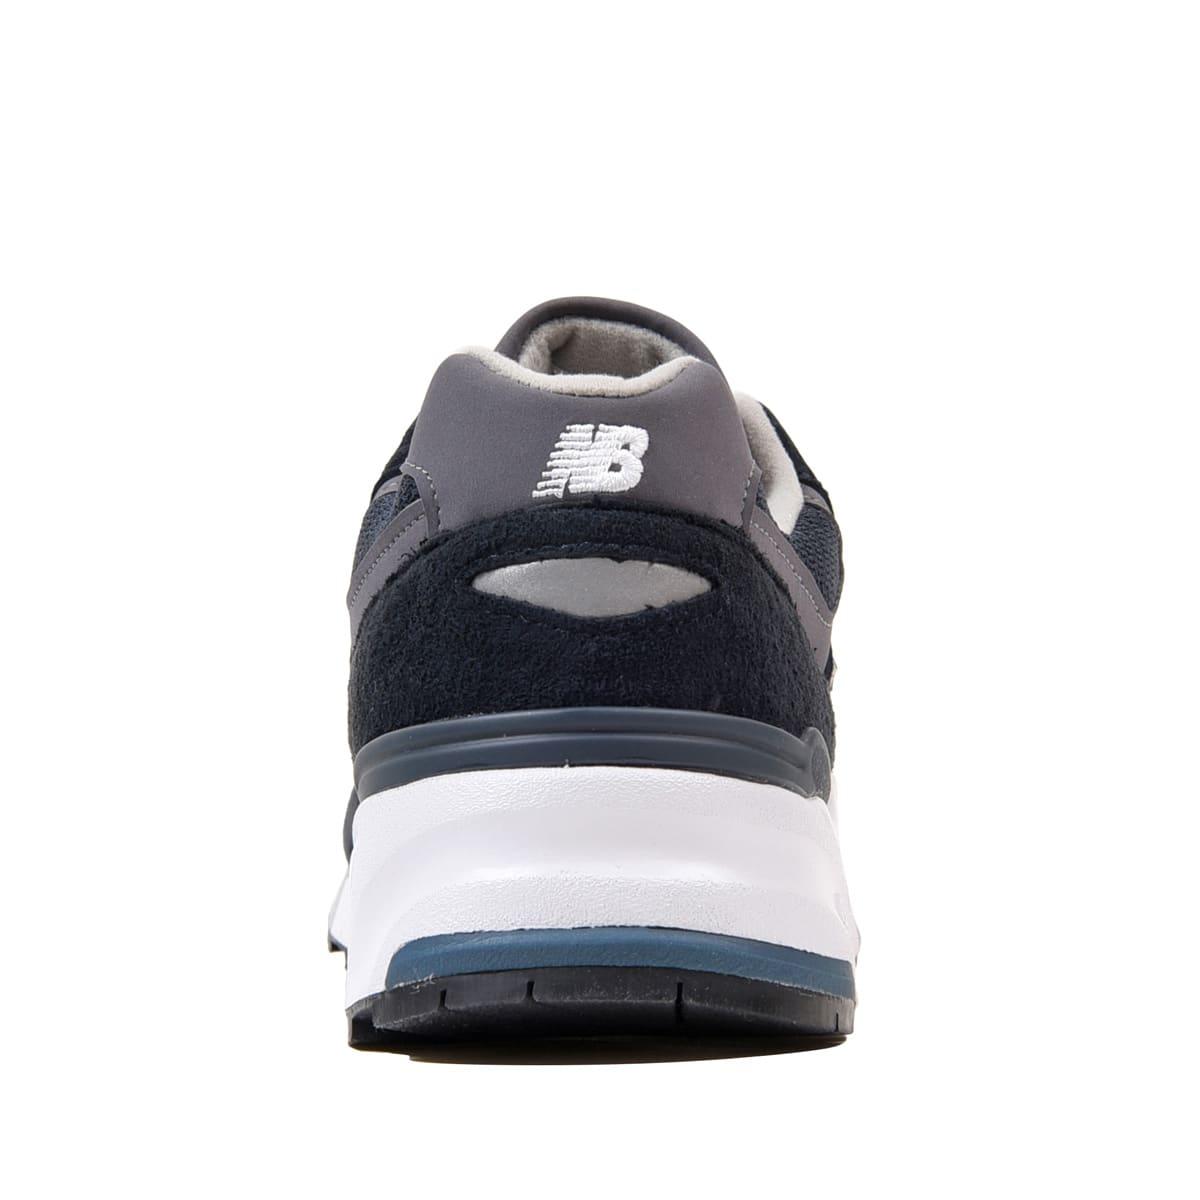 competitive price 5622e b2c78 New Balance M999CBL NAVY